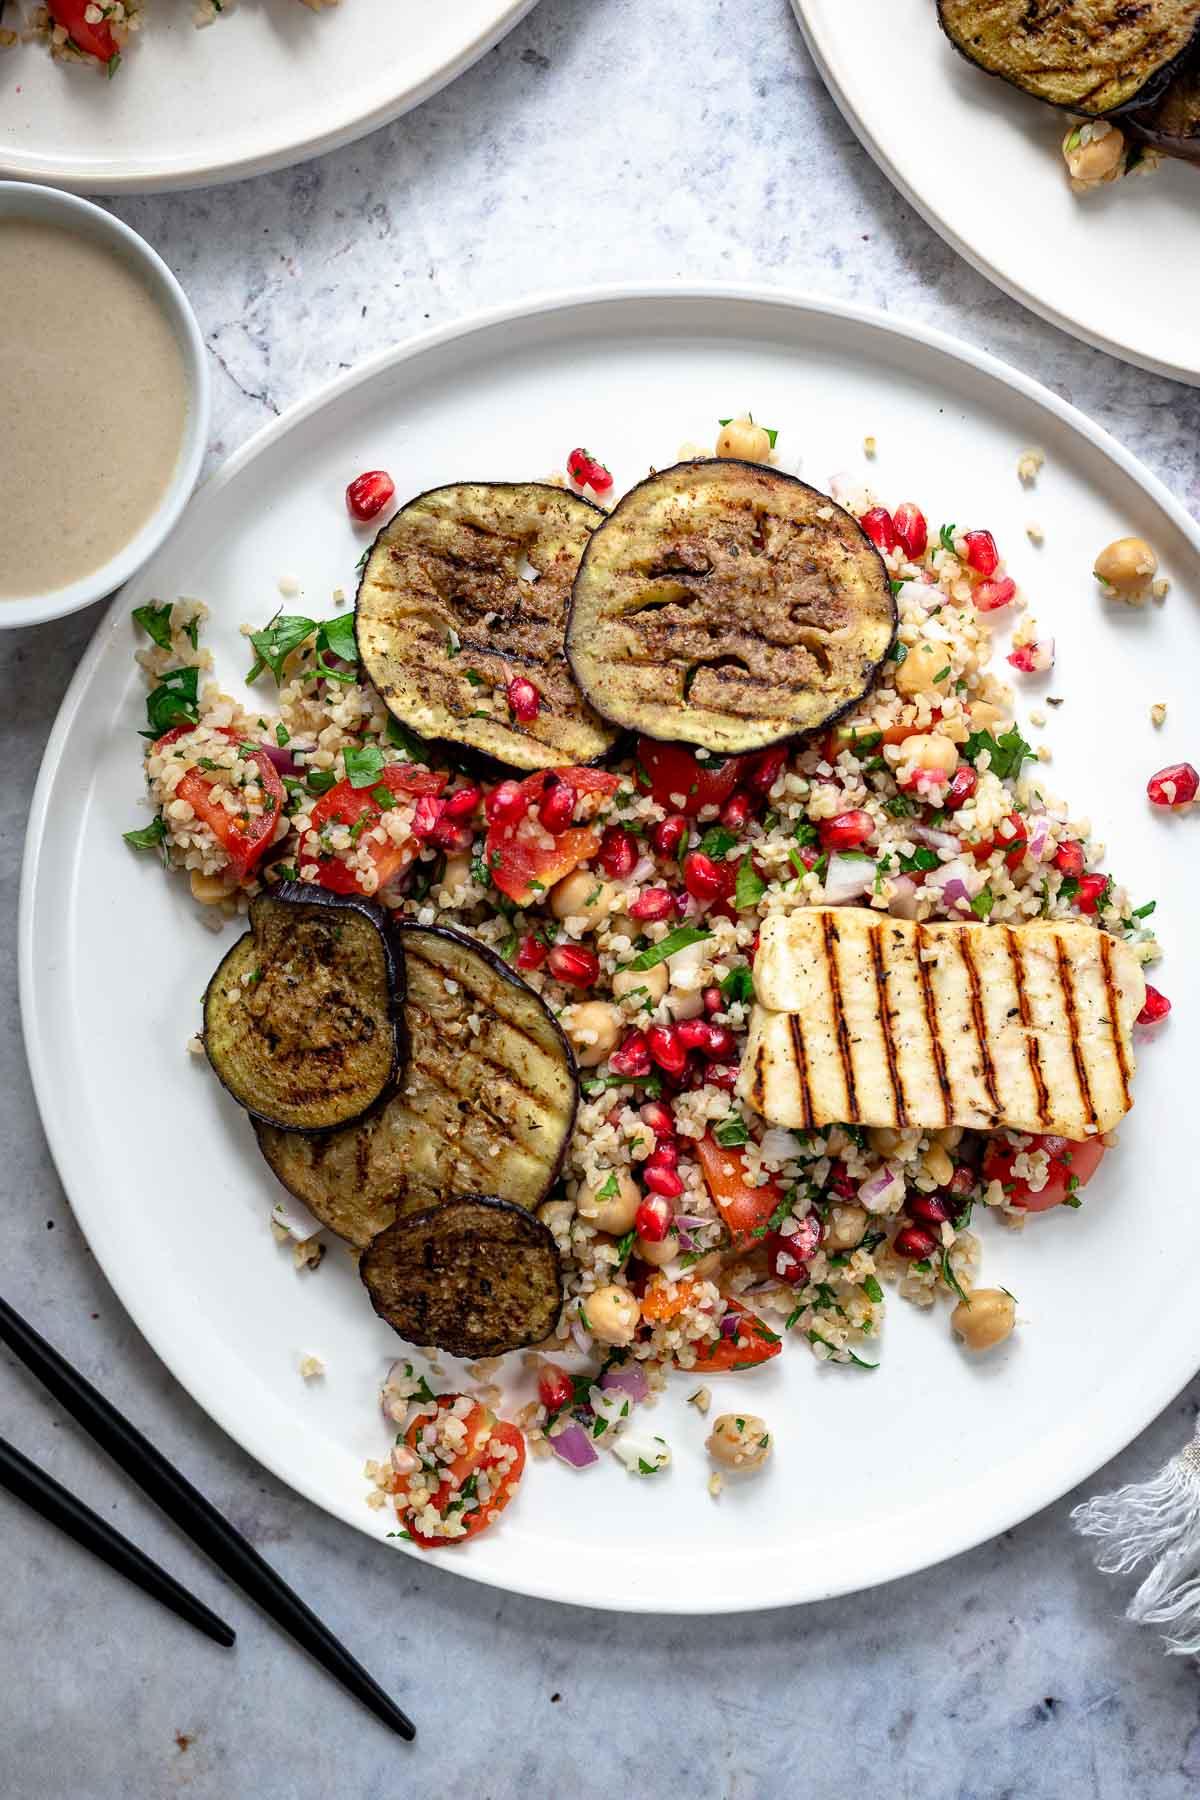 Bulgur Chickpea Salad with Grilled Halloumi and Eggplant